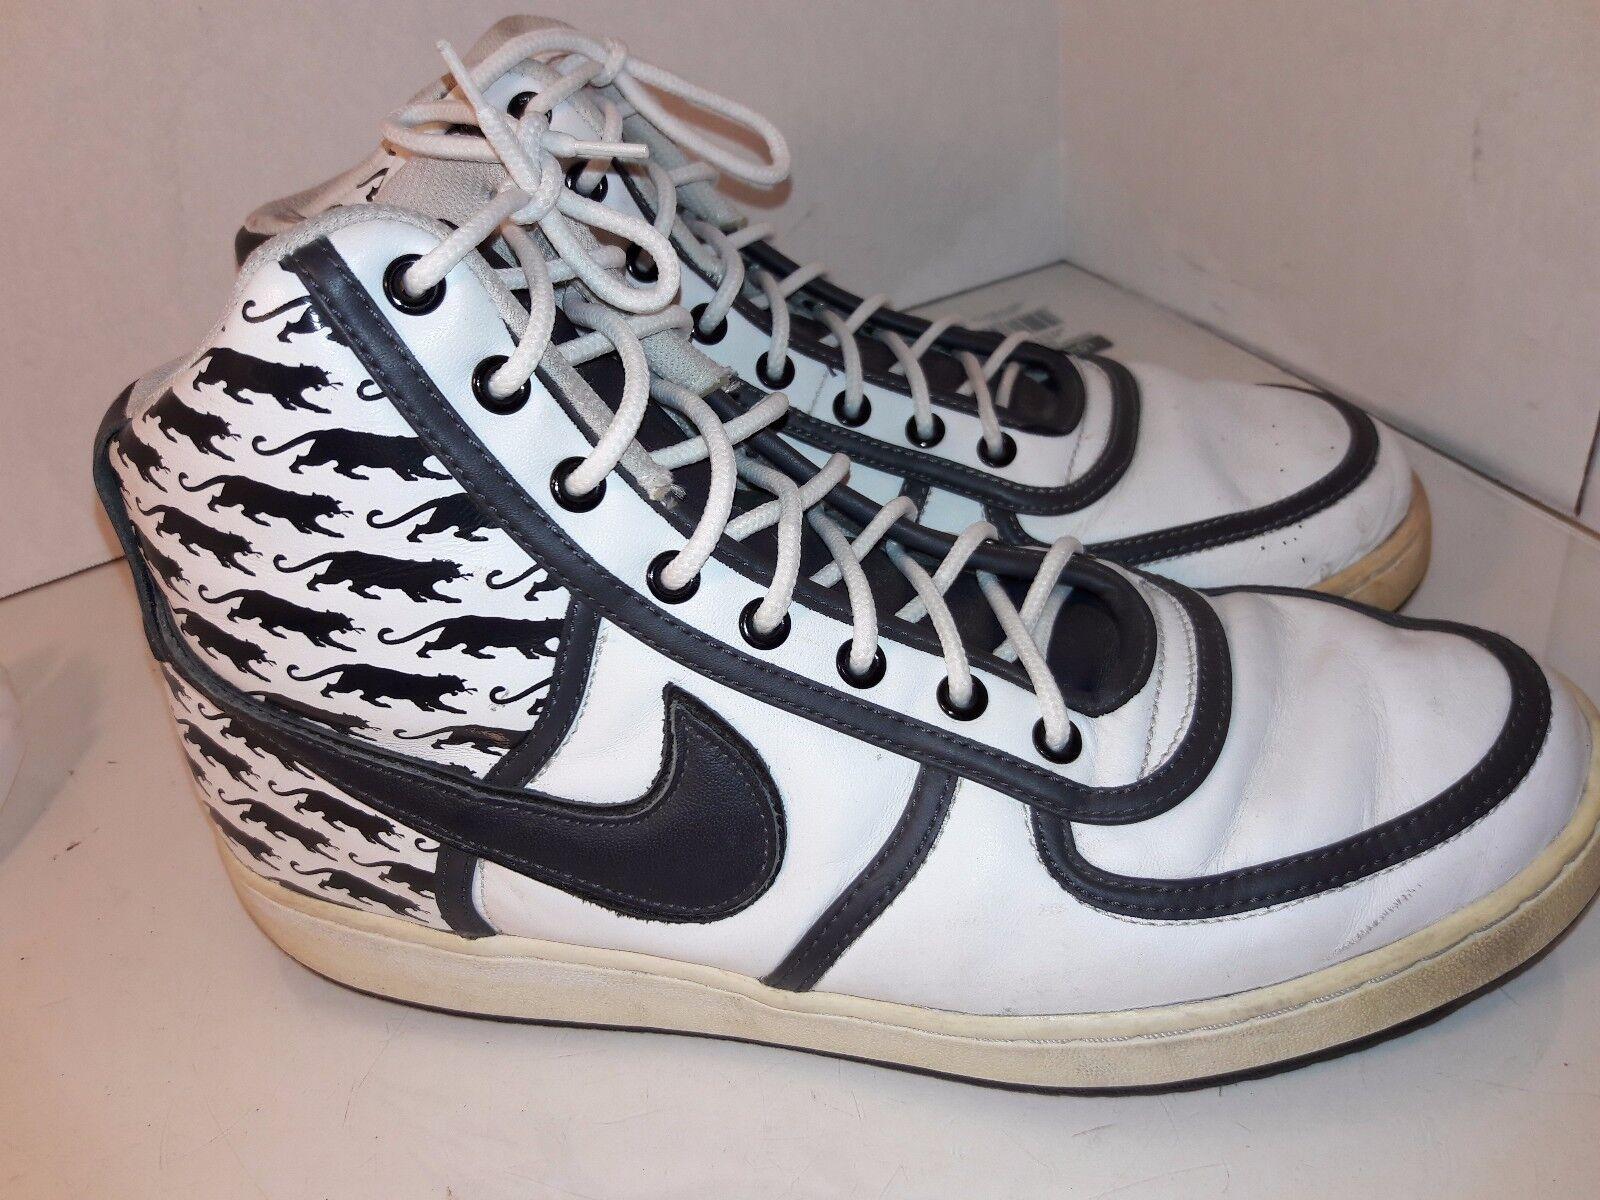 Nike Vandal High Philly Black Panthers, Black Fives 314878-101 Mens SZ 11.5